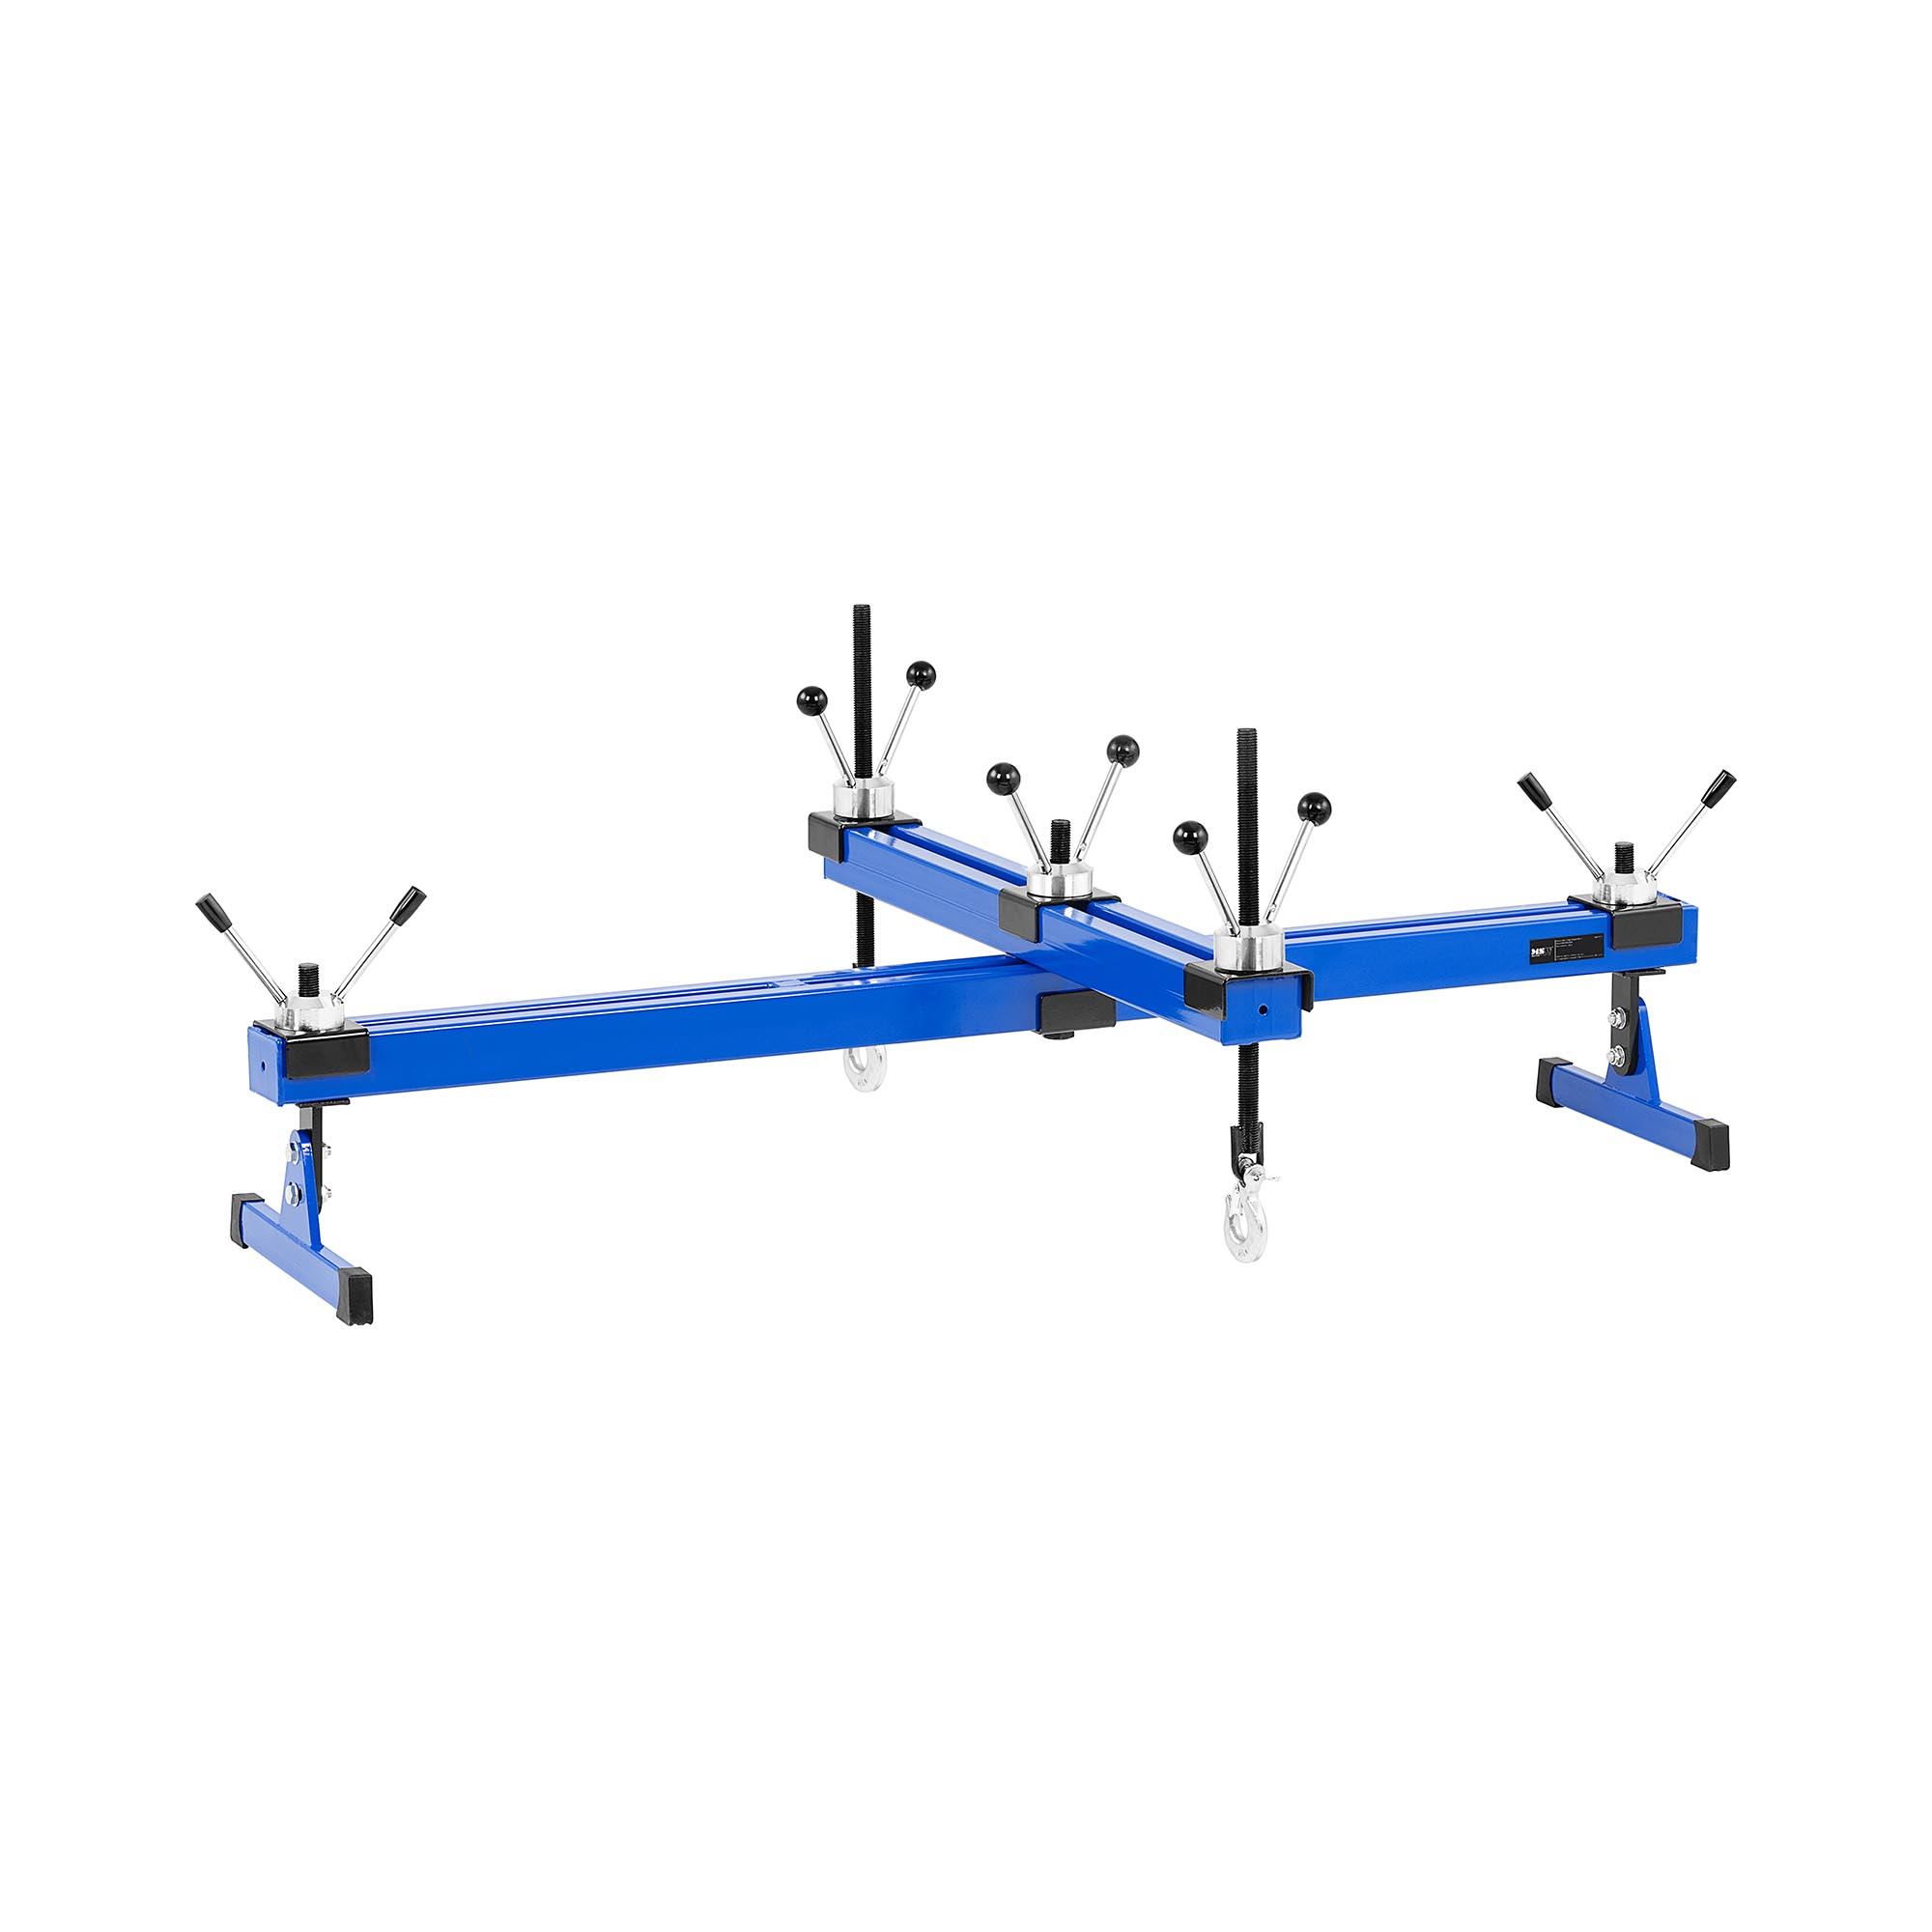 MSW Motorbrücke - mit Querträger - 500 kg - Hauptträger: 14 - 140 cm - Querträger: 14 - 81 cm MSW-MB-500N